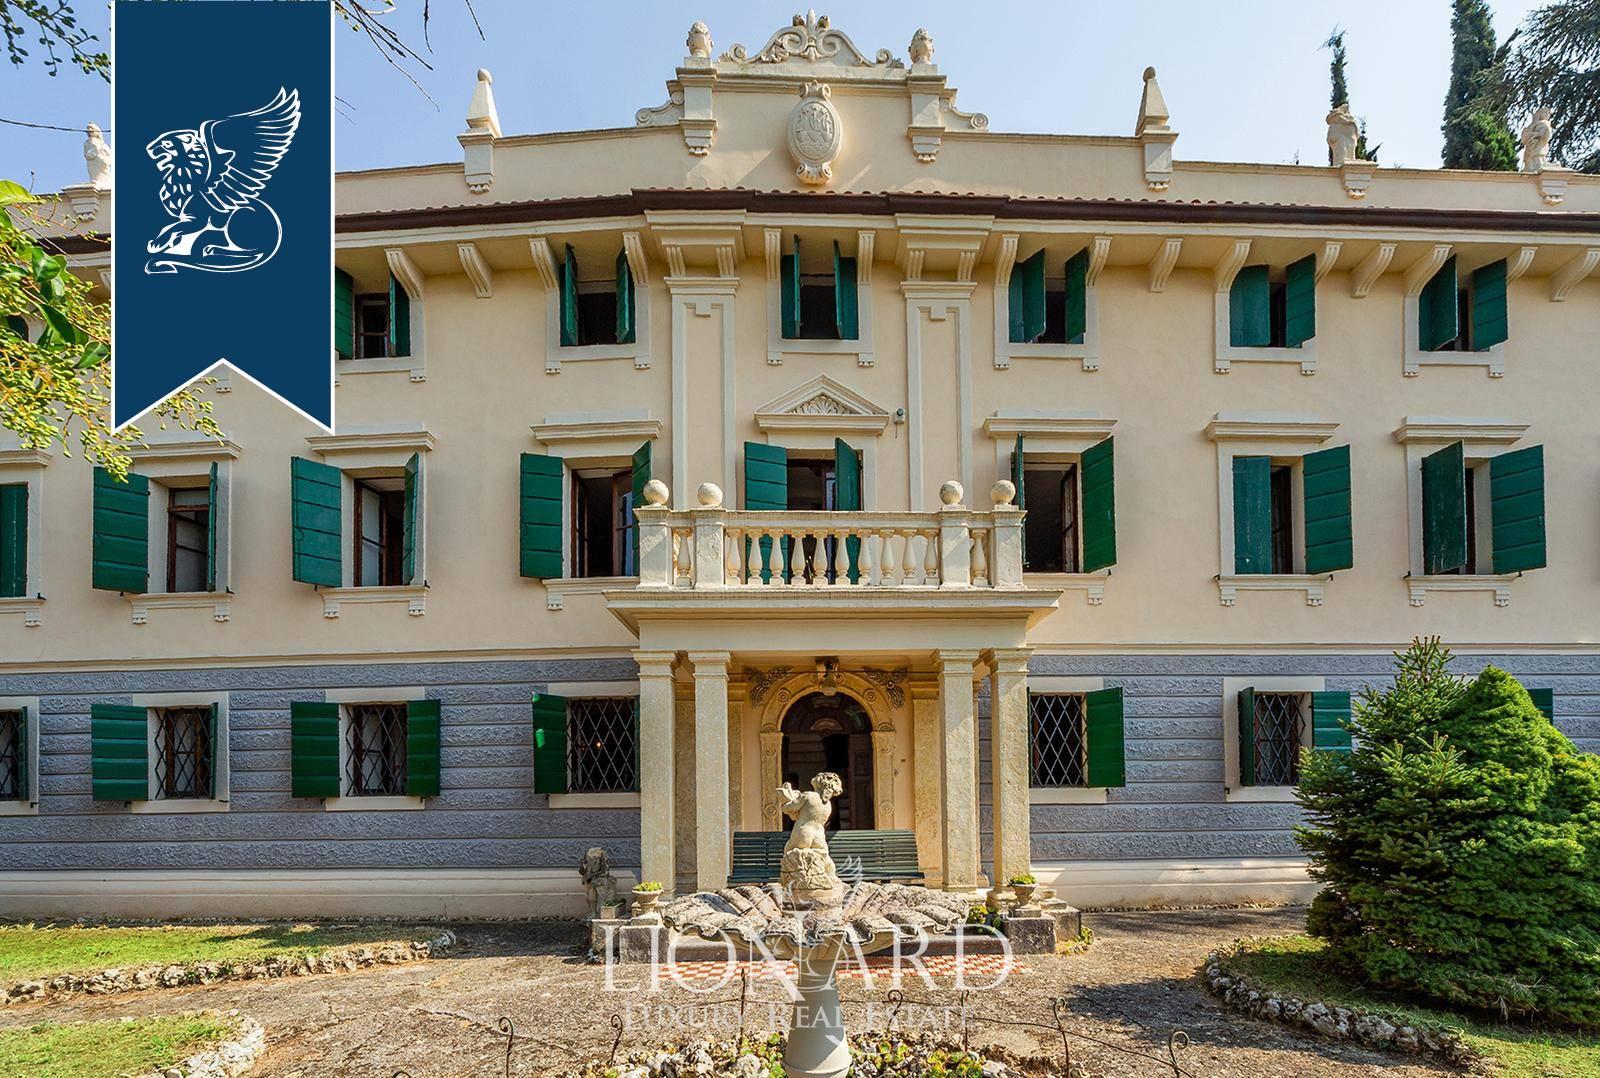 Villa in Vendita a Verona: 0 locali, 900 mq - Foto 6